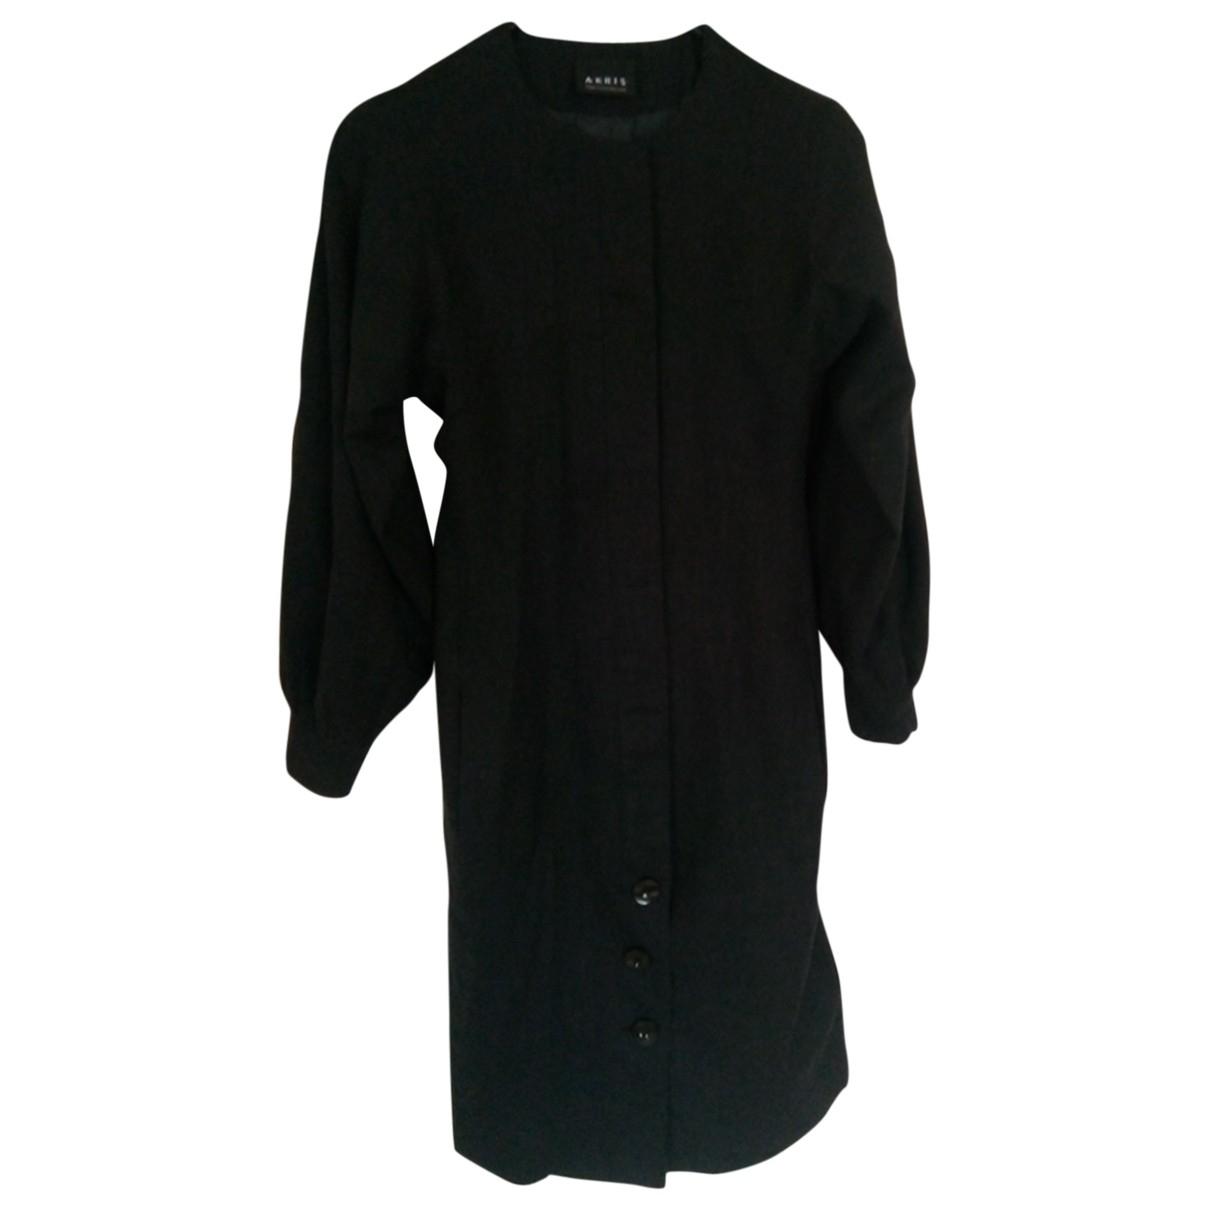 Akris \N Kleid in  Anthrazit Wolle